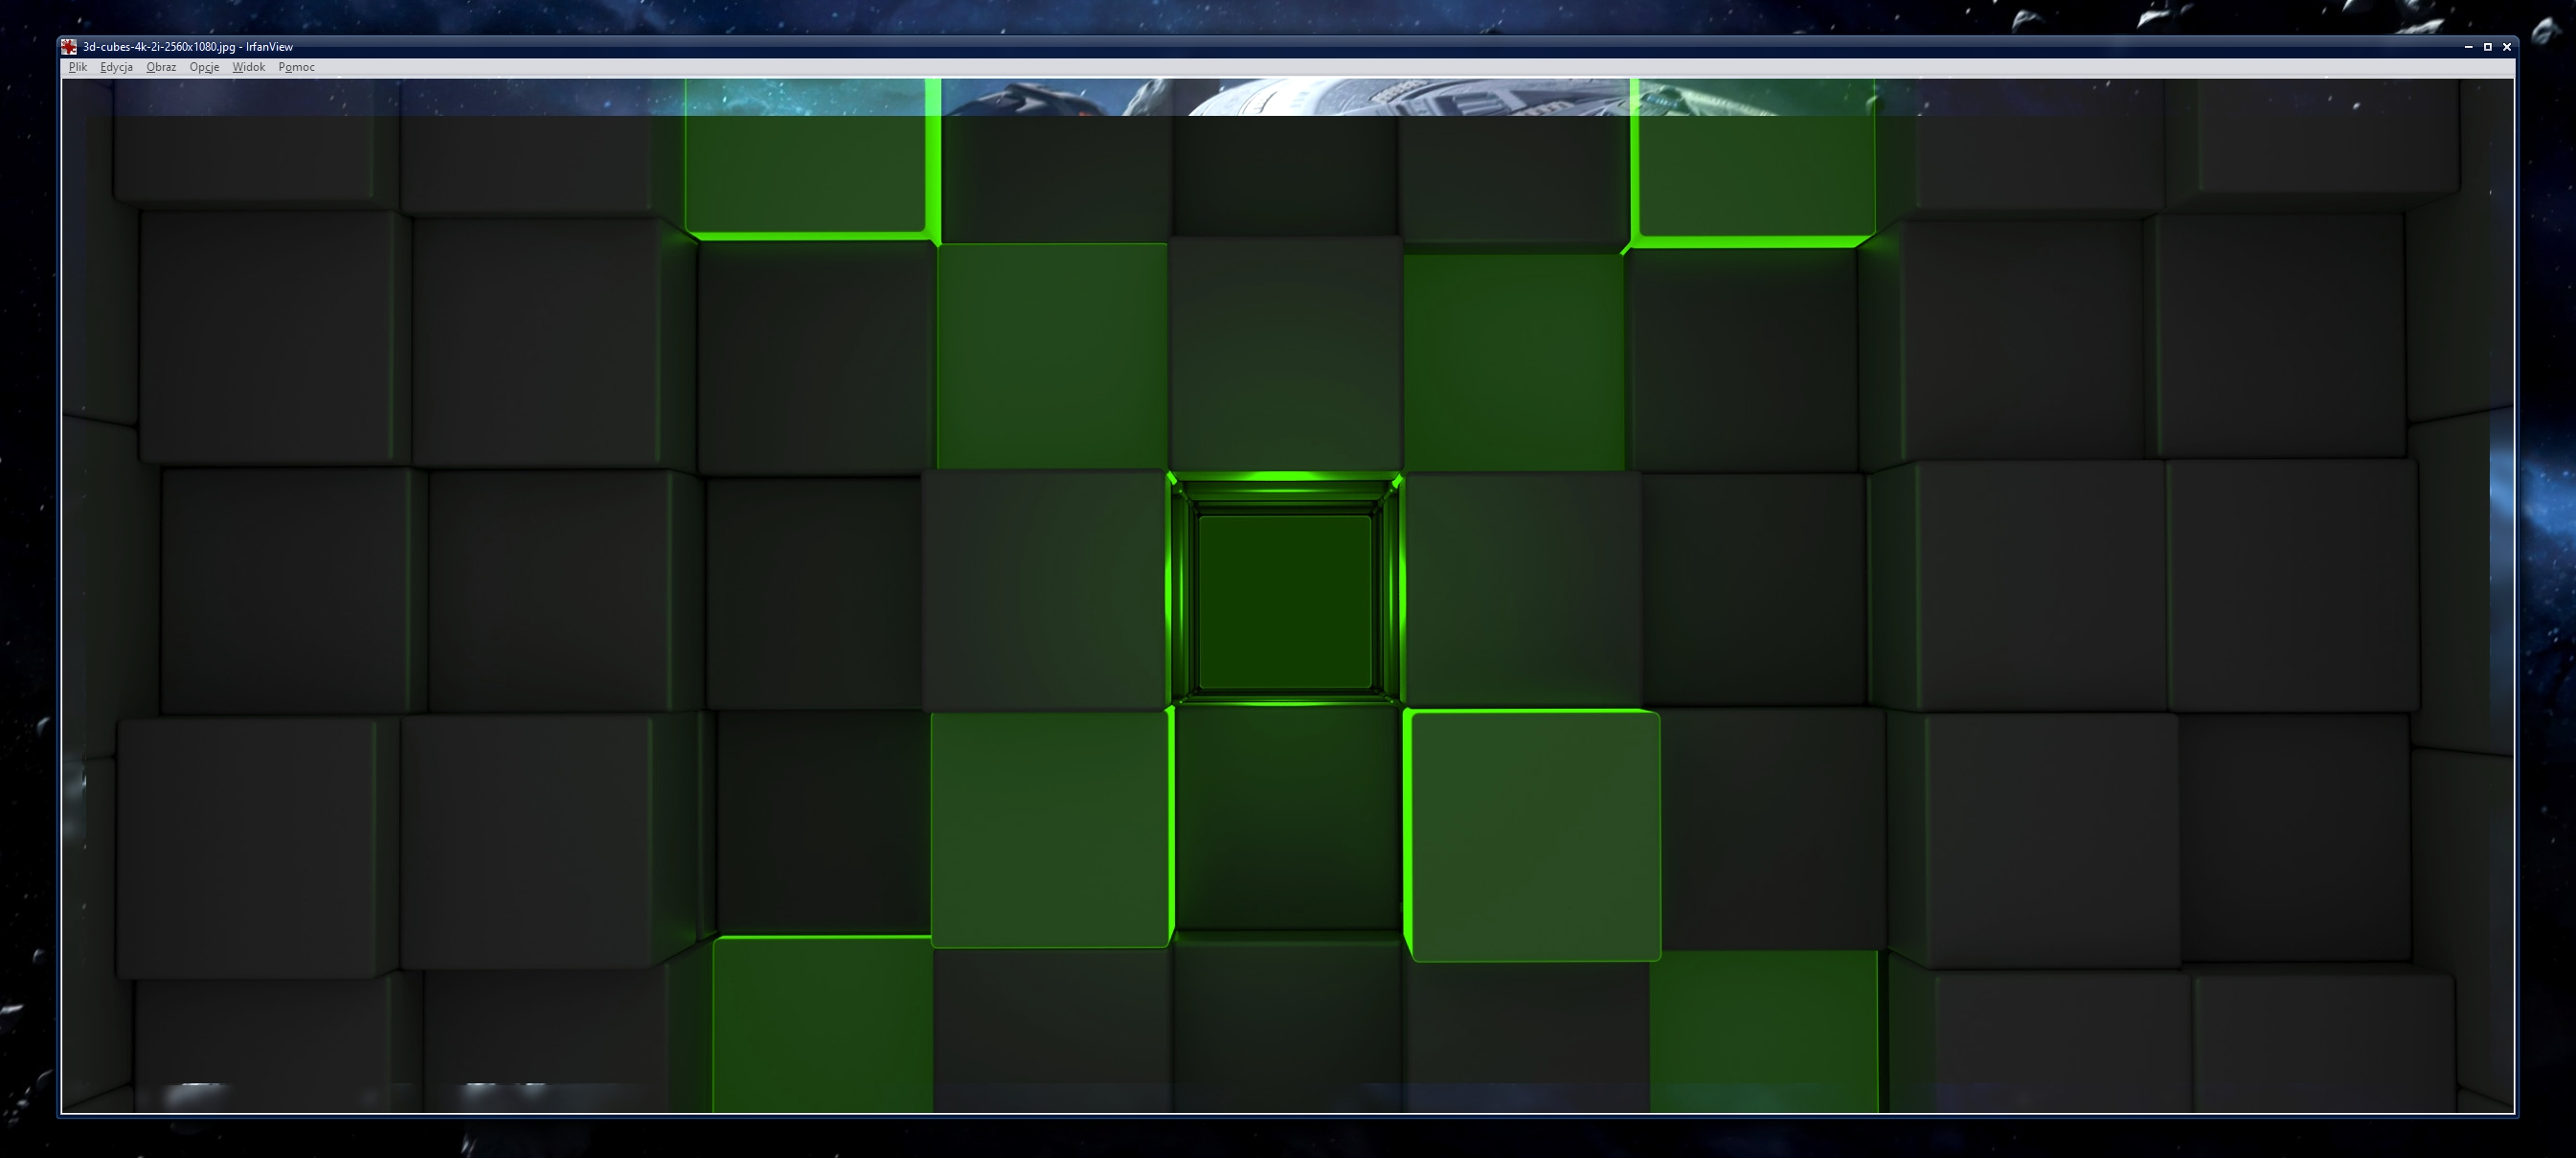 Glass bug in Windows 10